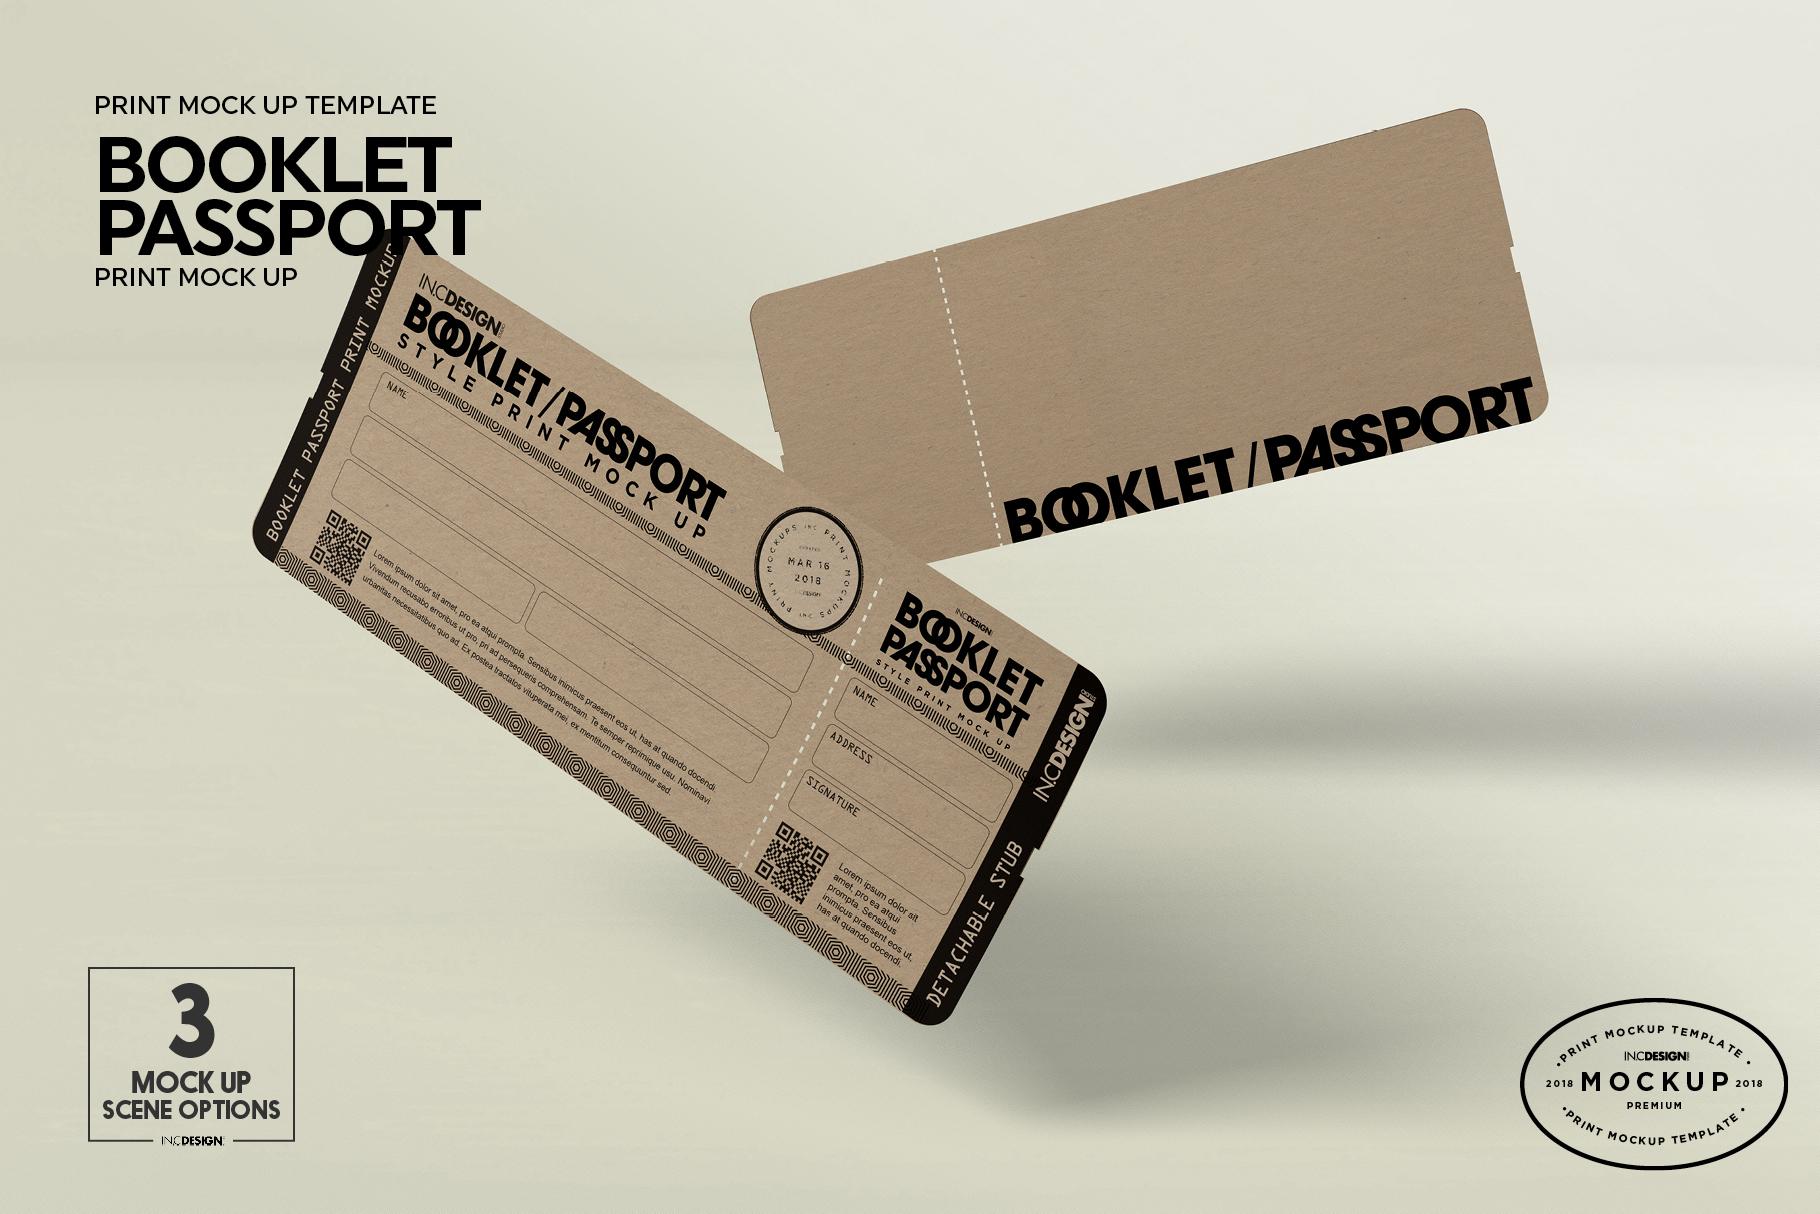 Booklet Passport Print MockUp example image 8